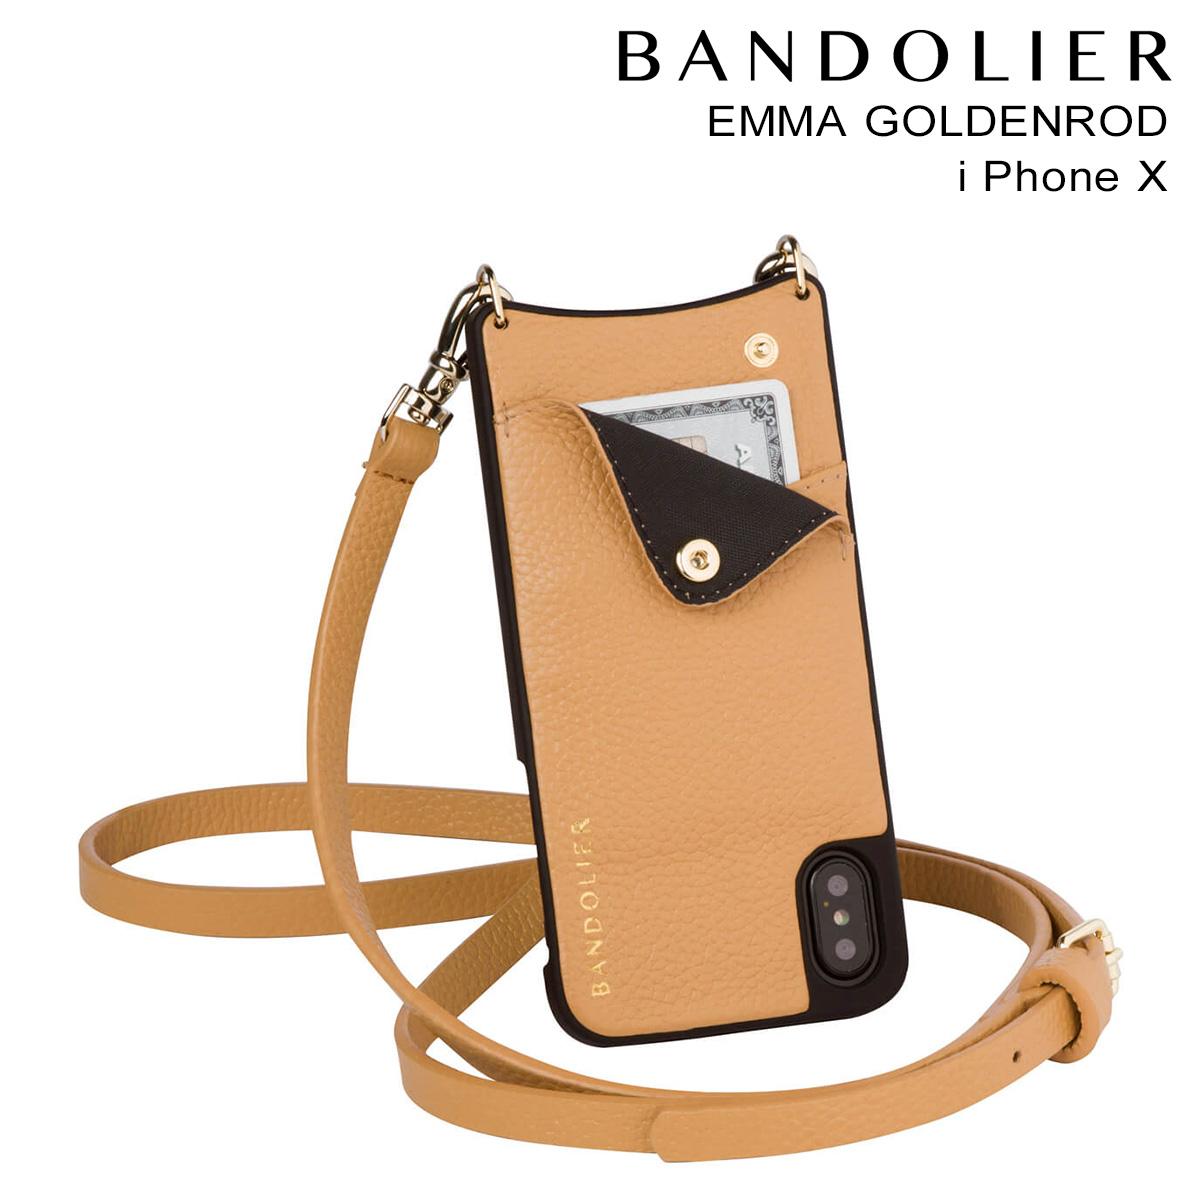 BANDOLIER iPhoneX EMMA GOLDENROD バンドリヤー ケース スマホ アイフォン レザー メンズ レディース